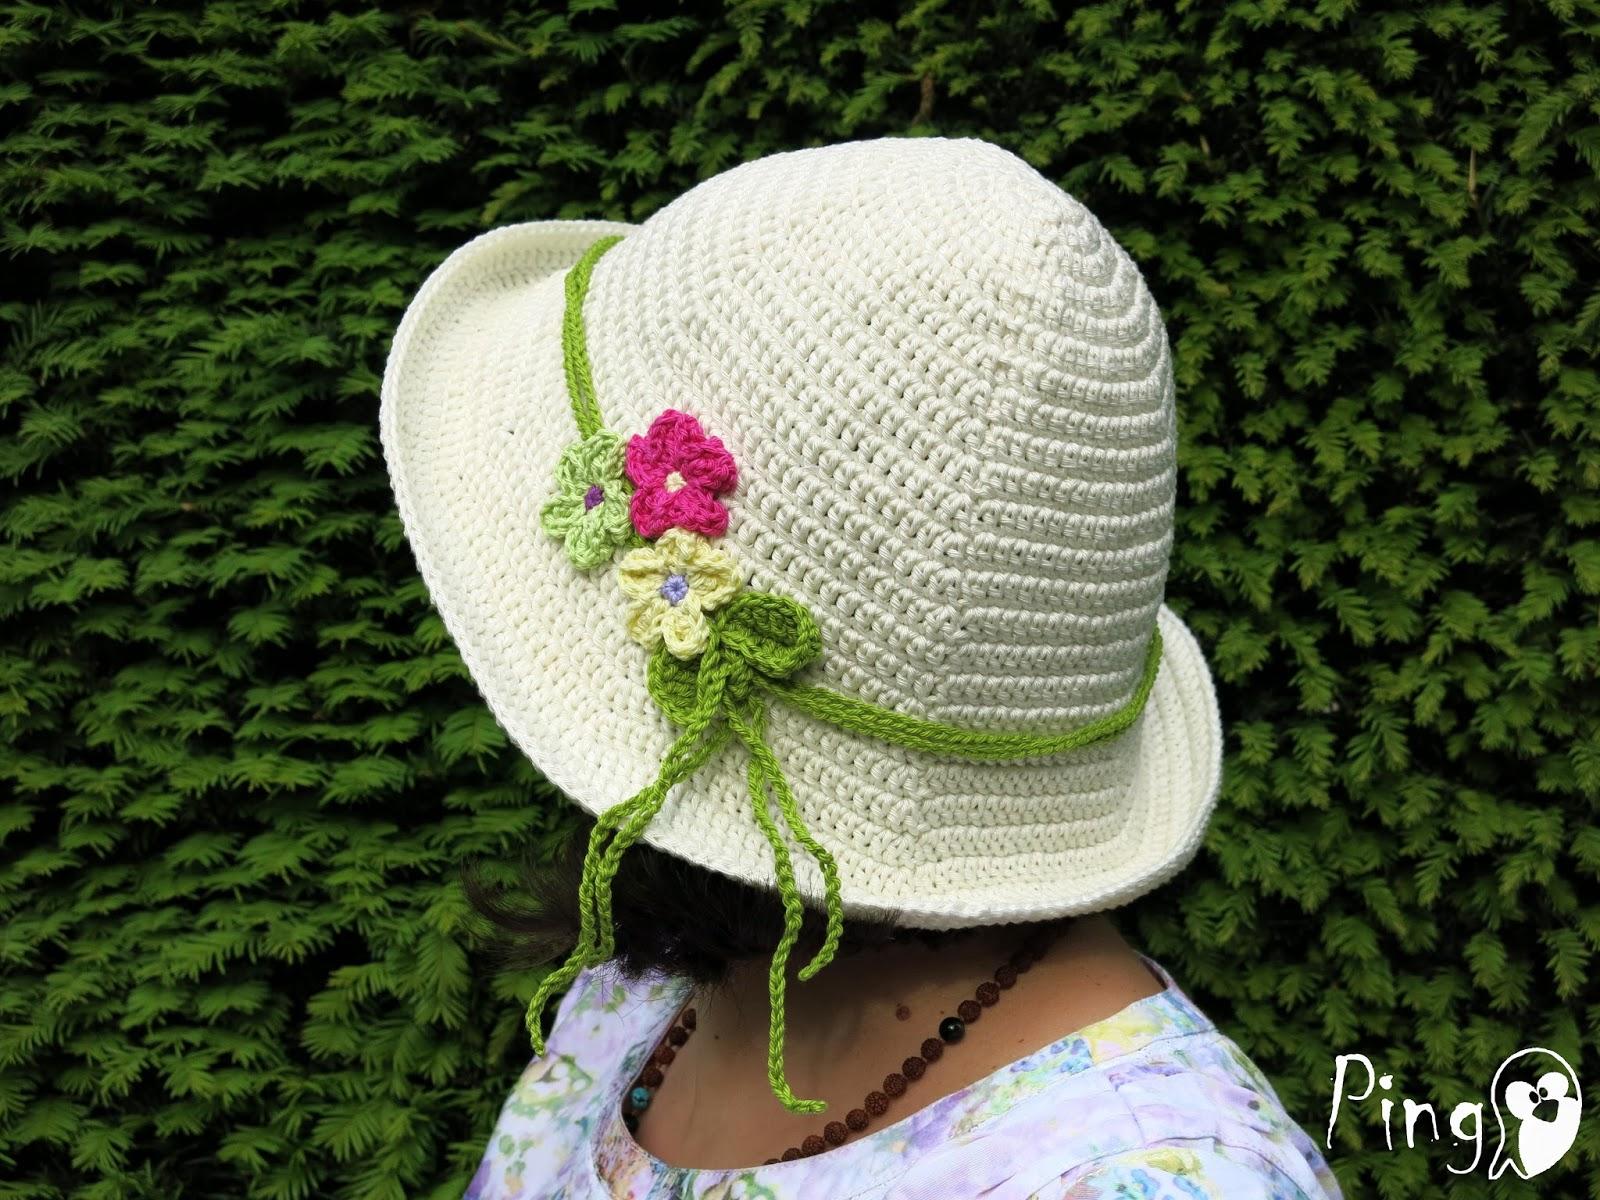 Pingo the pink penguin crochet hat summer breeze crochet hat summer breeze free crochet hat pattern by pingo the pink penguin dt1010fo